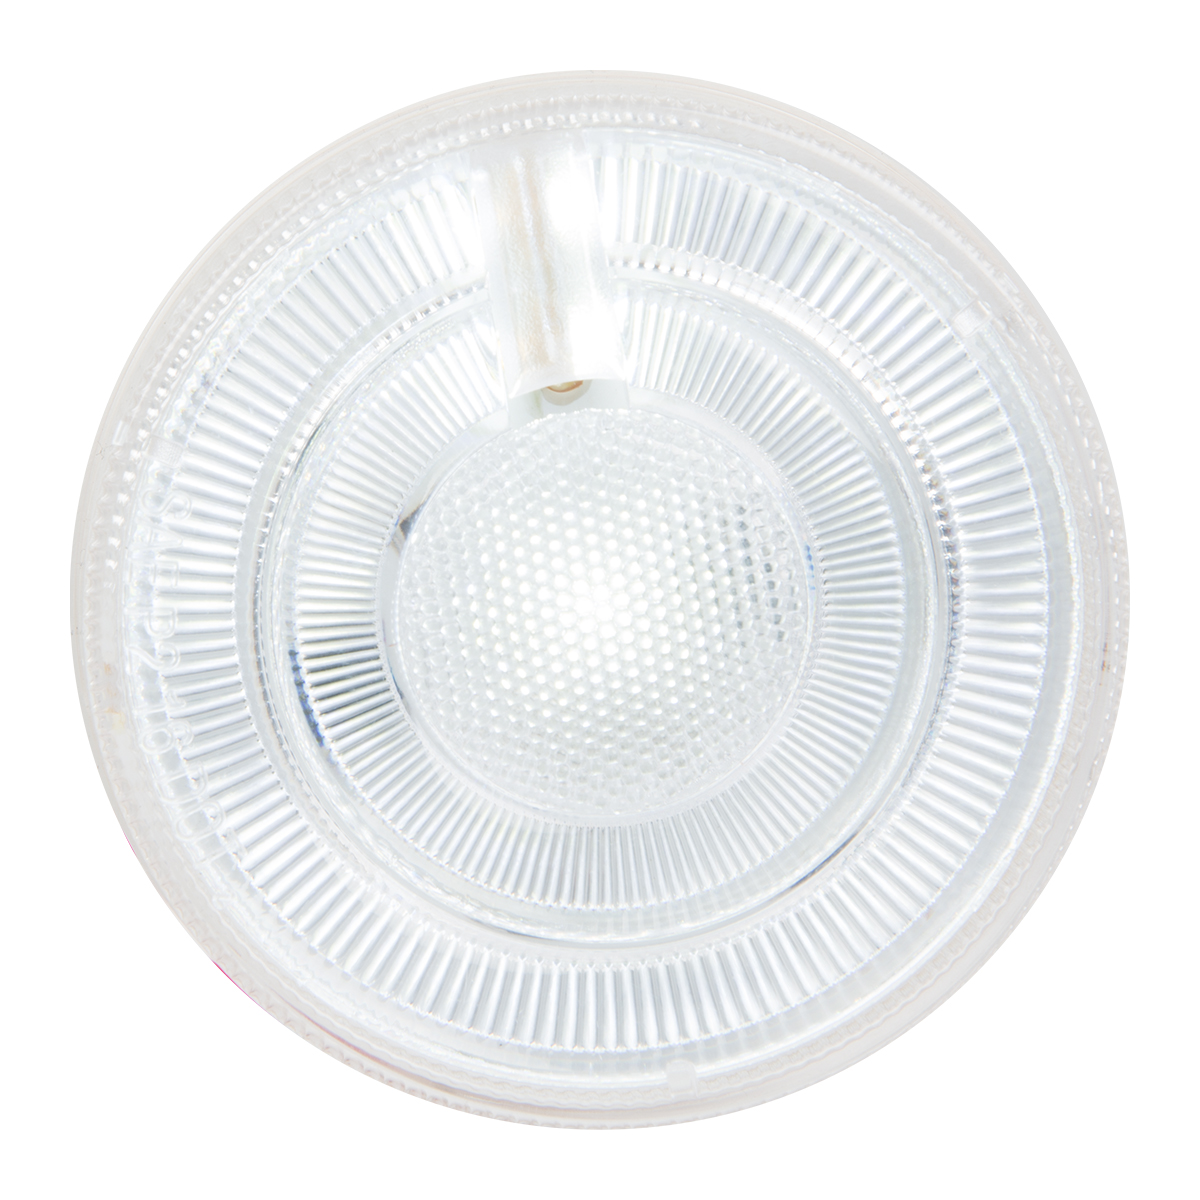 "75944 2-1/2"" Prime LED Marker Light"